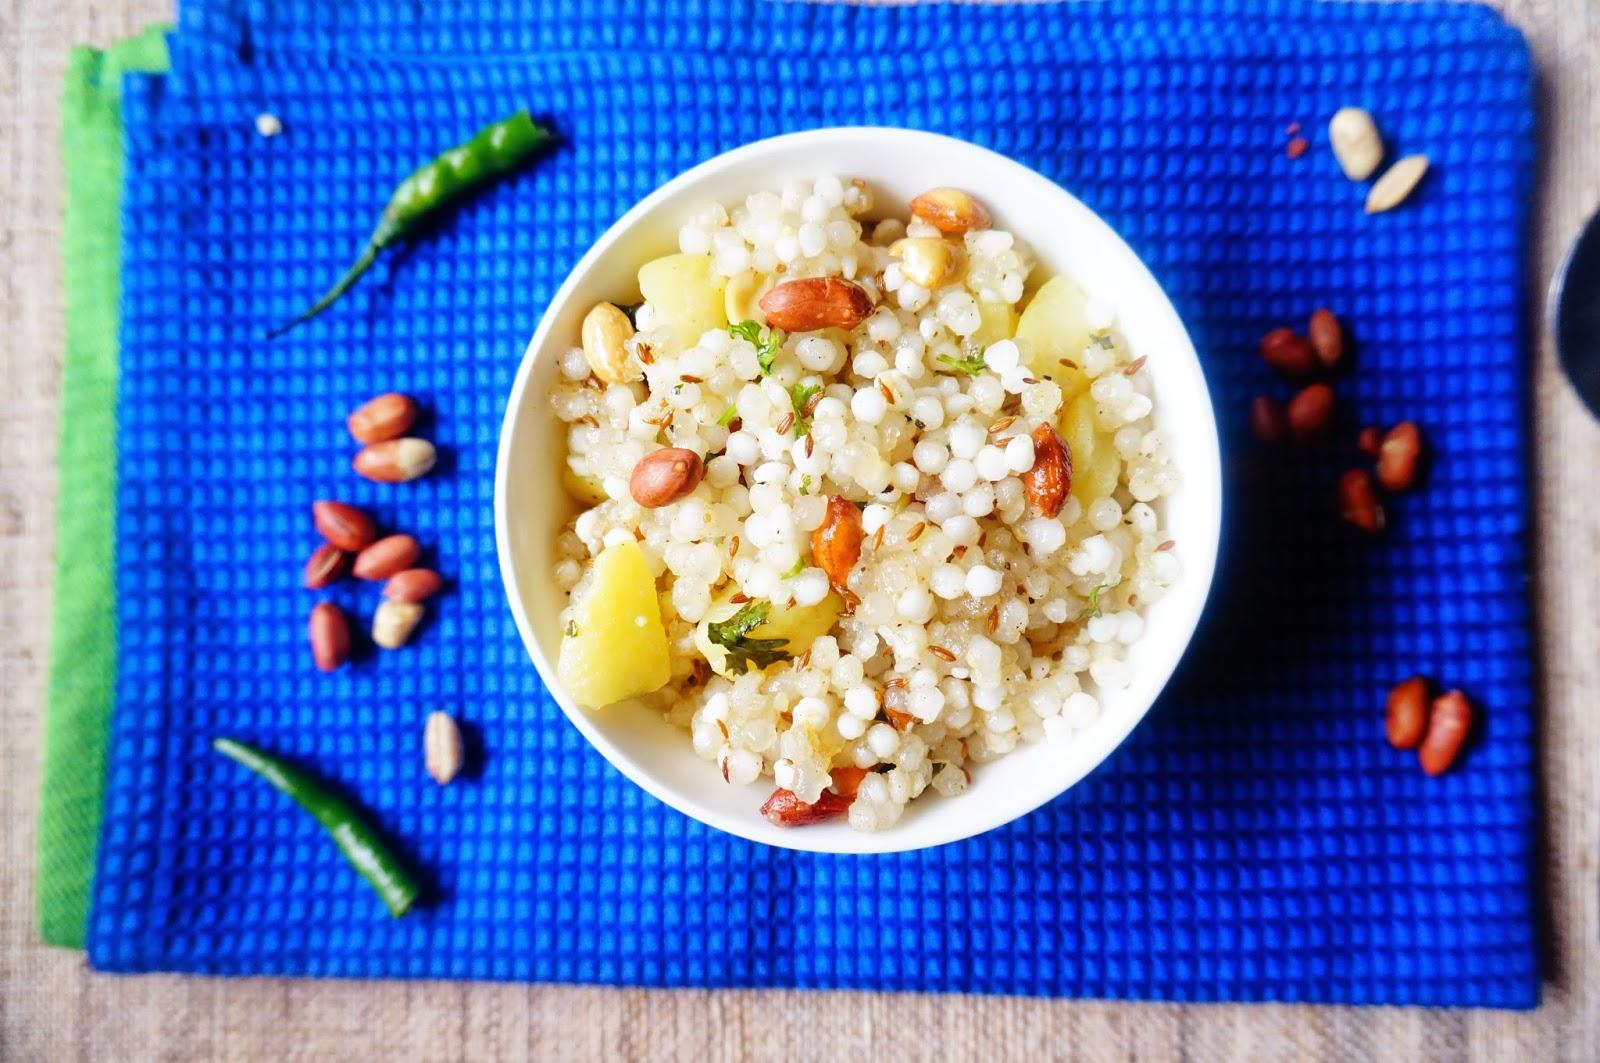 Sabudana Khichdi,Sabudana Chaat,Pearl Sago, vrat ka khanna,fasting food